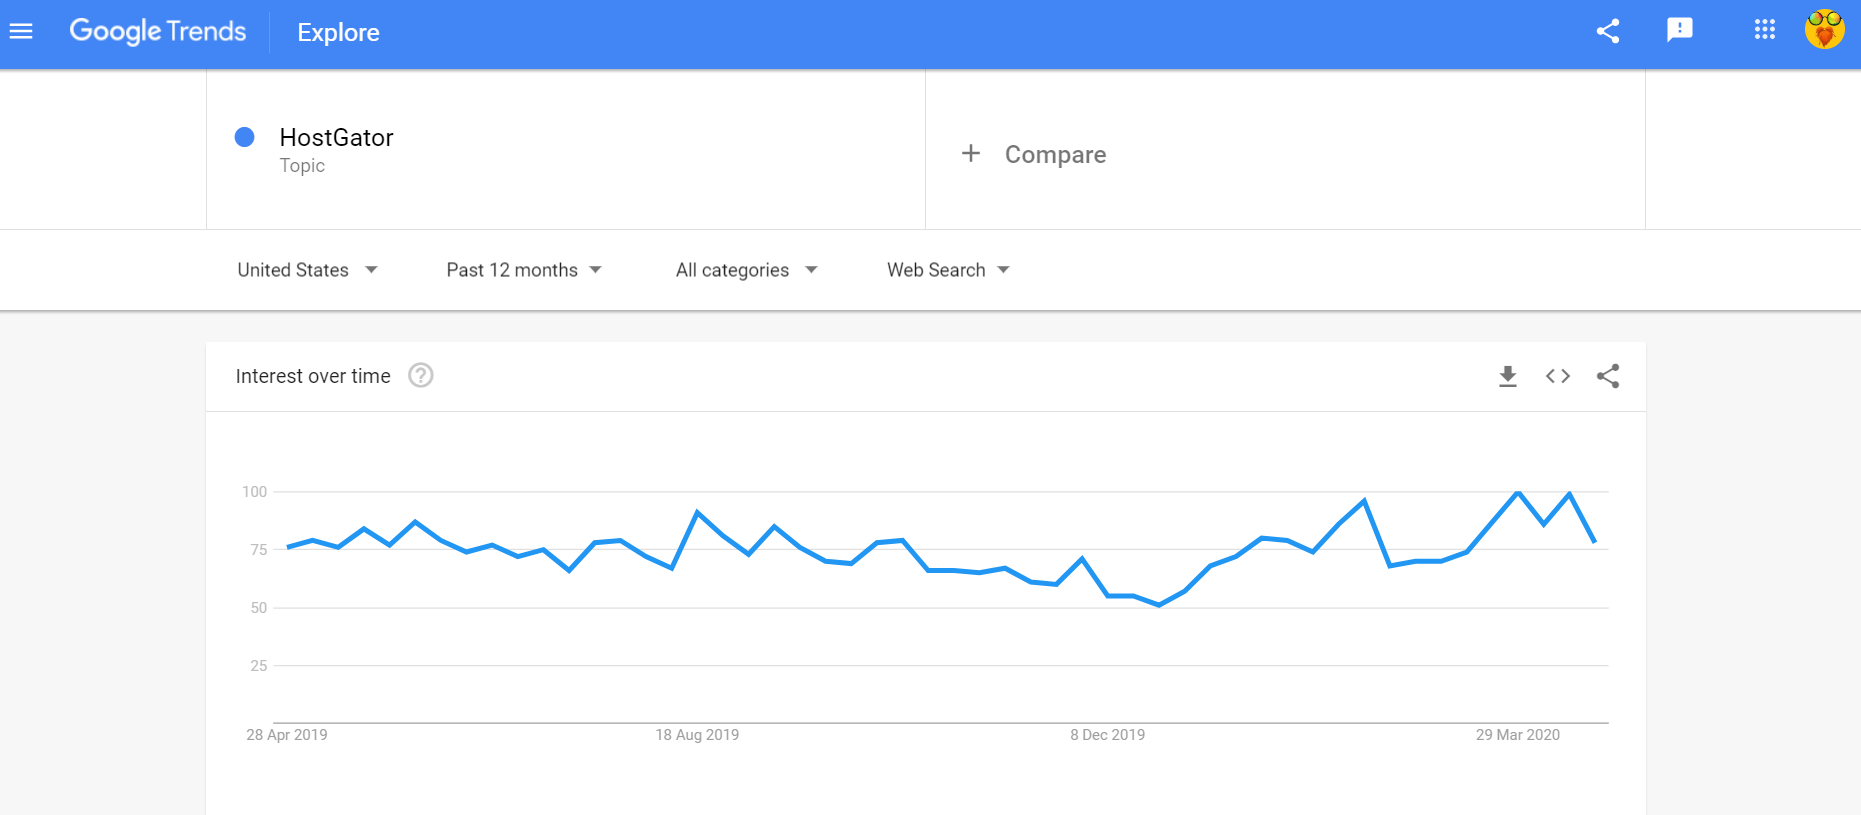 HostGator Google Trends